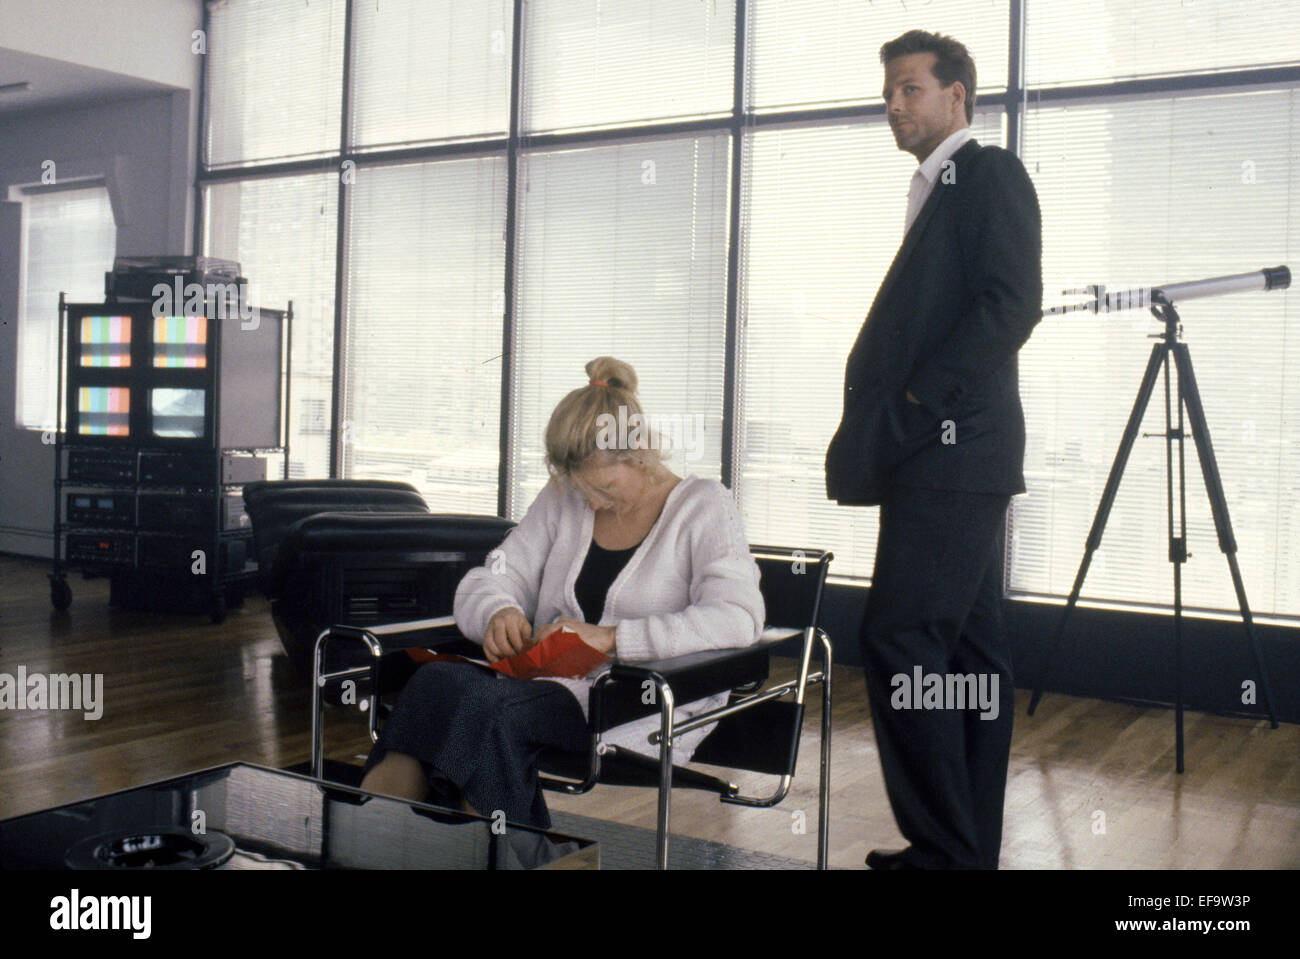 KIM BASINGER MICKEY ROURKE NINE 1 2 WEEKS 9 AND A HALF 1986